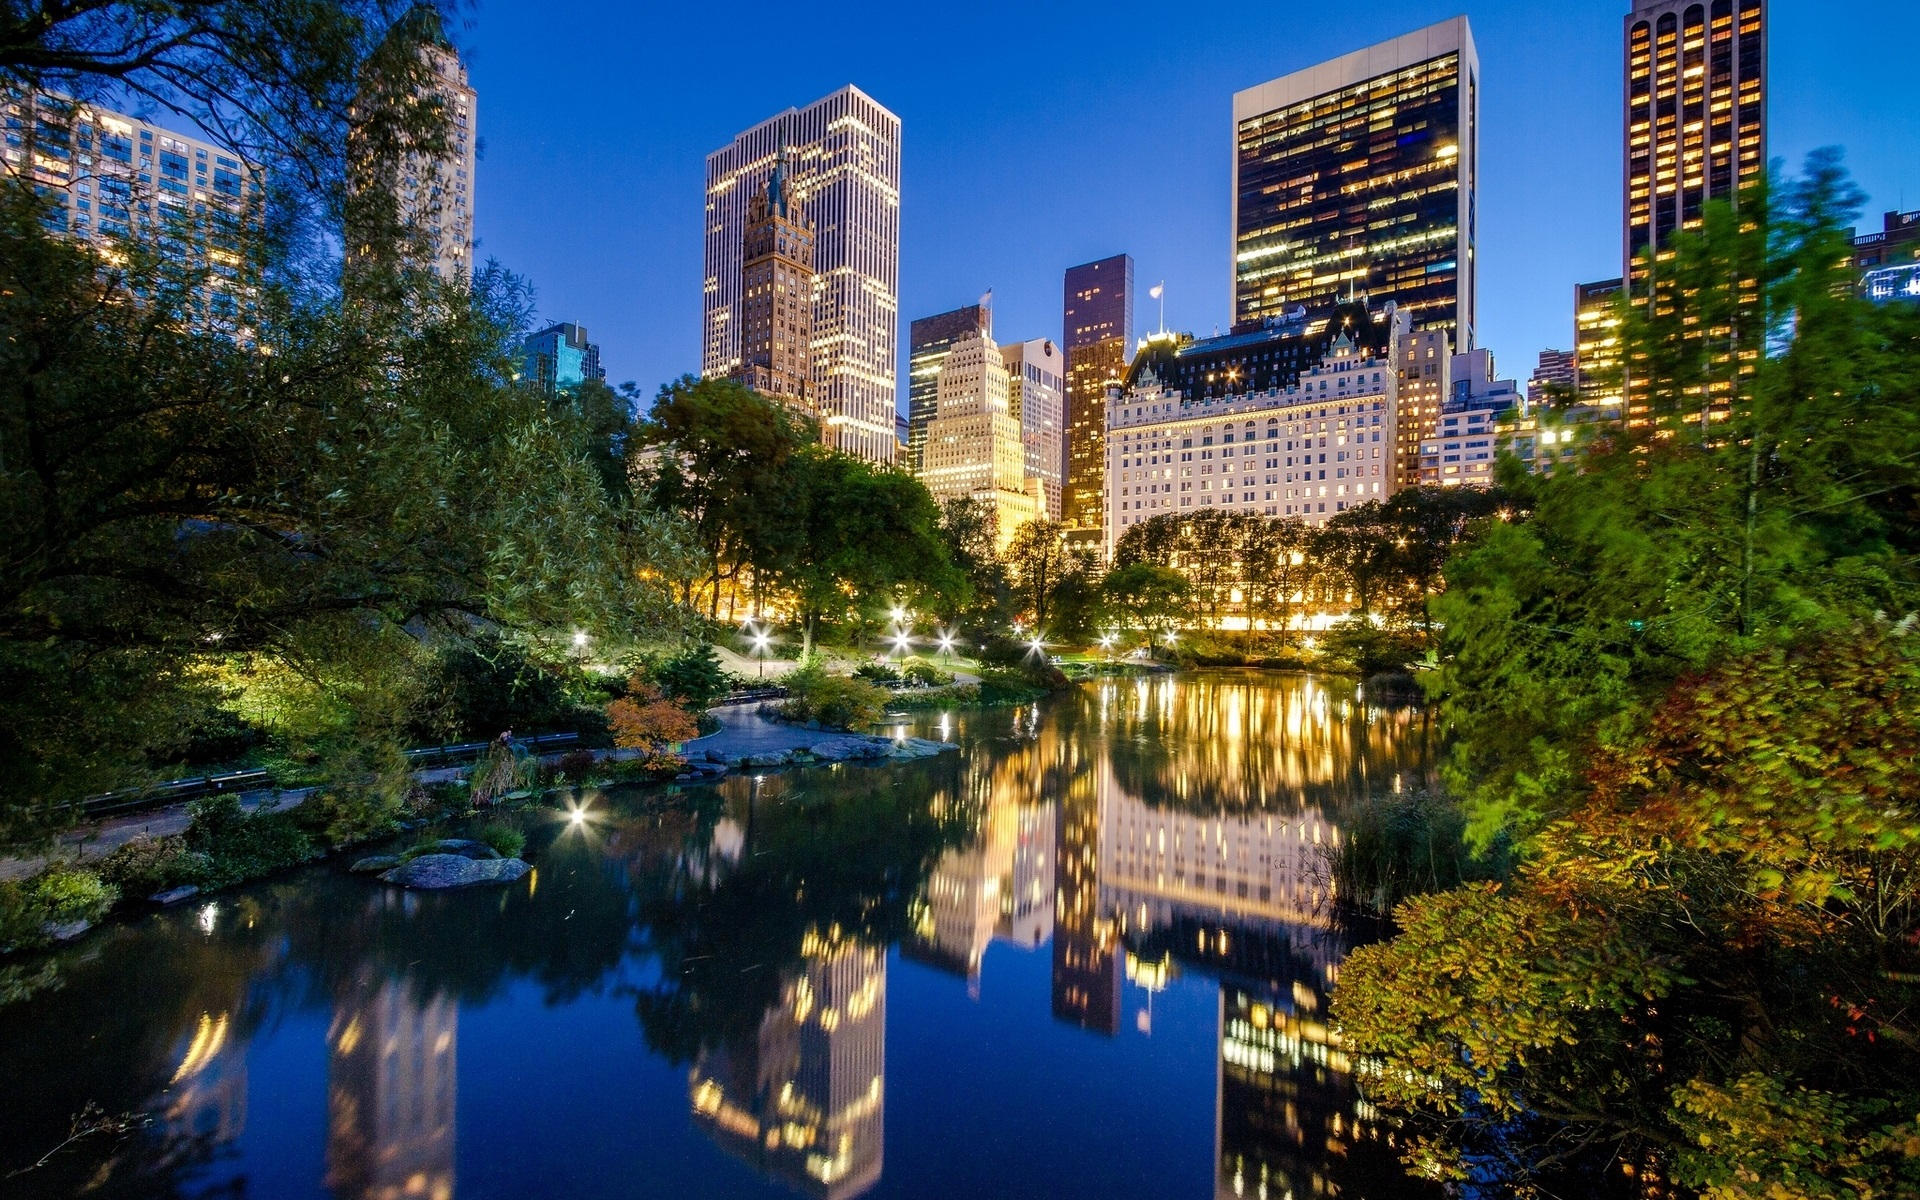 New-York-City-Manhattan-Central-Park-USA-lake-buildings-night-city_1920x1200